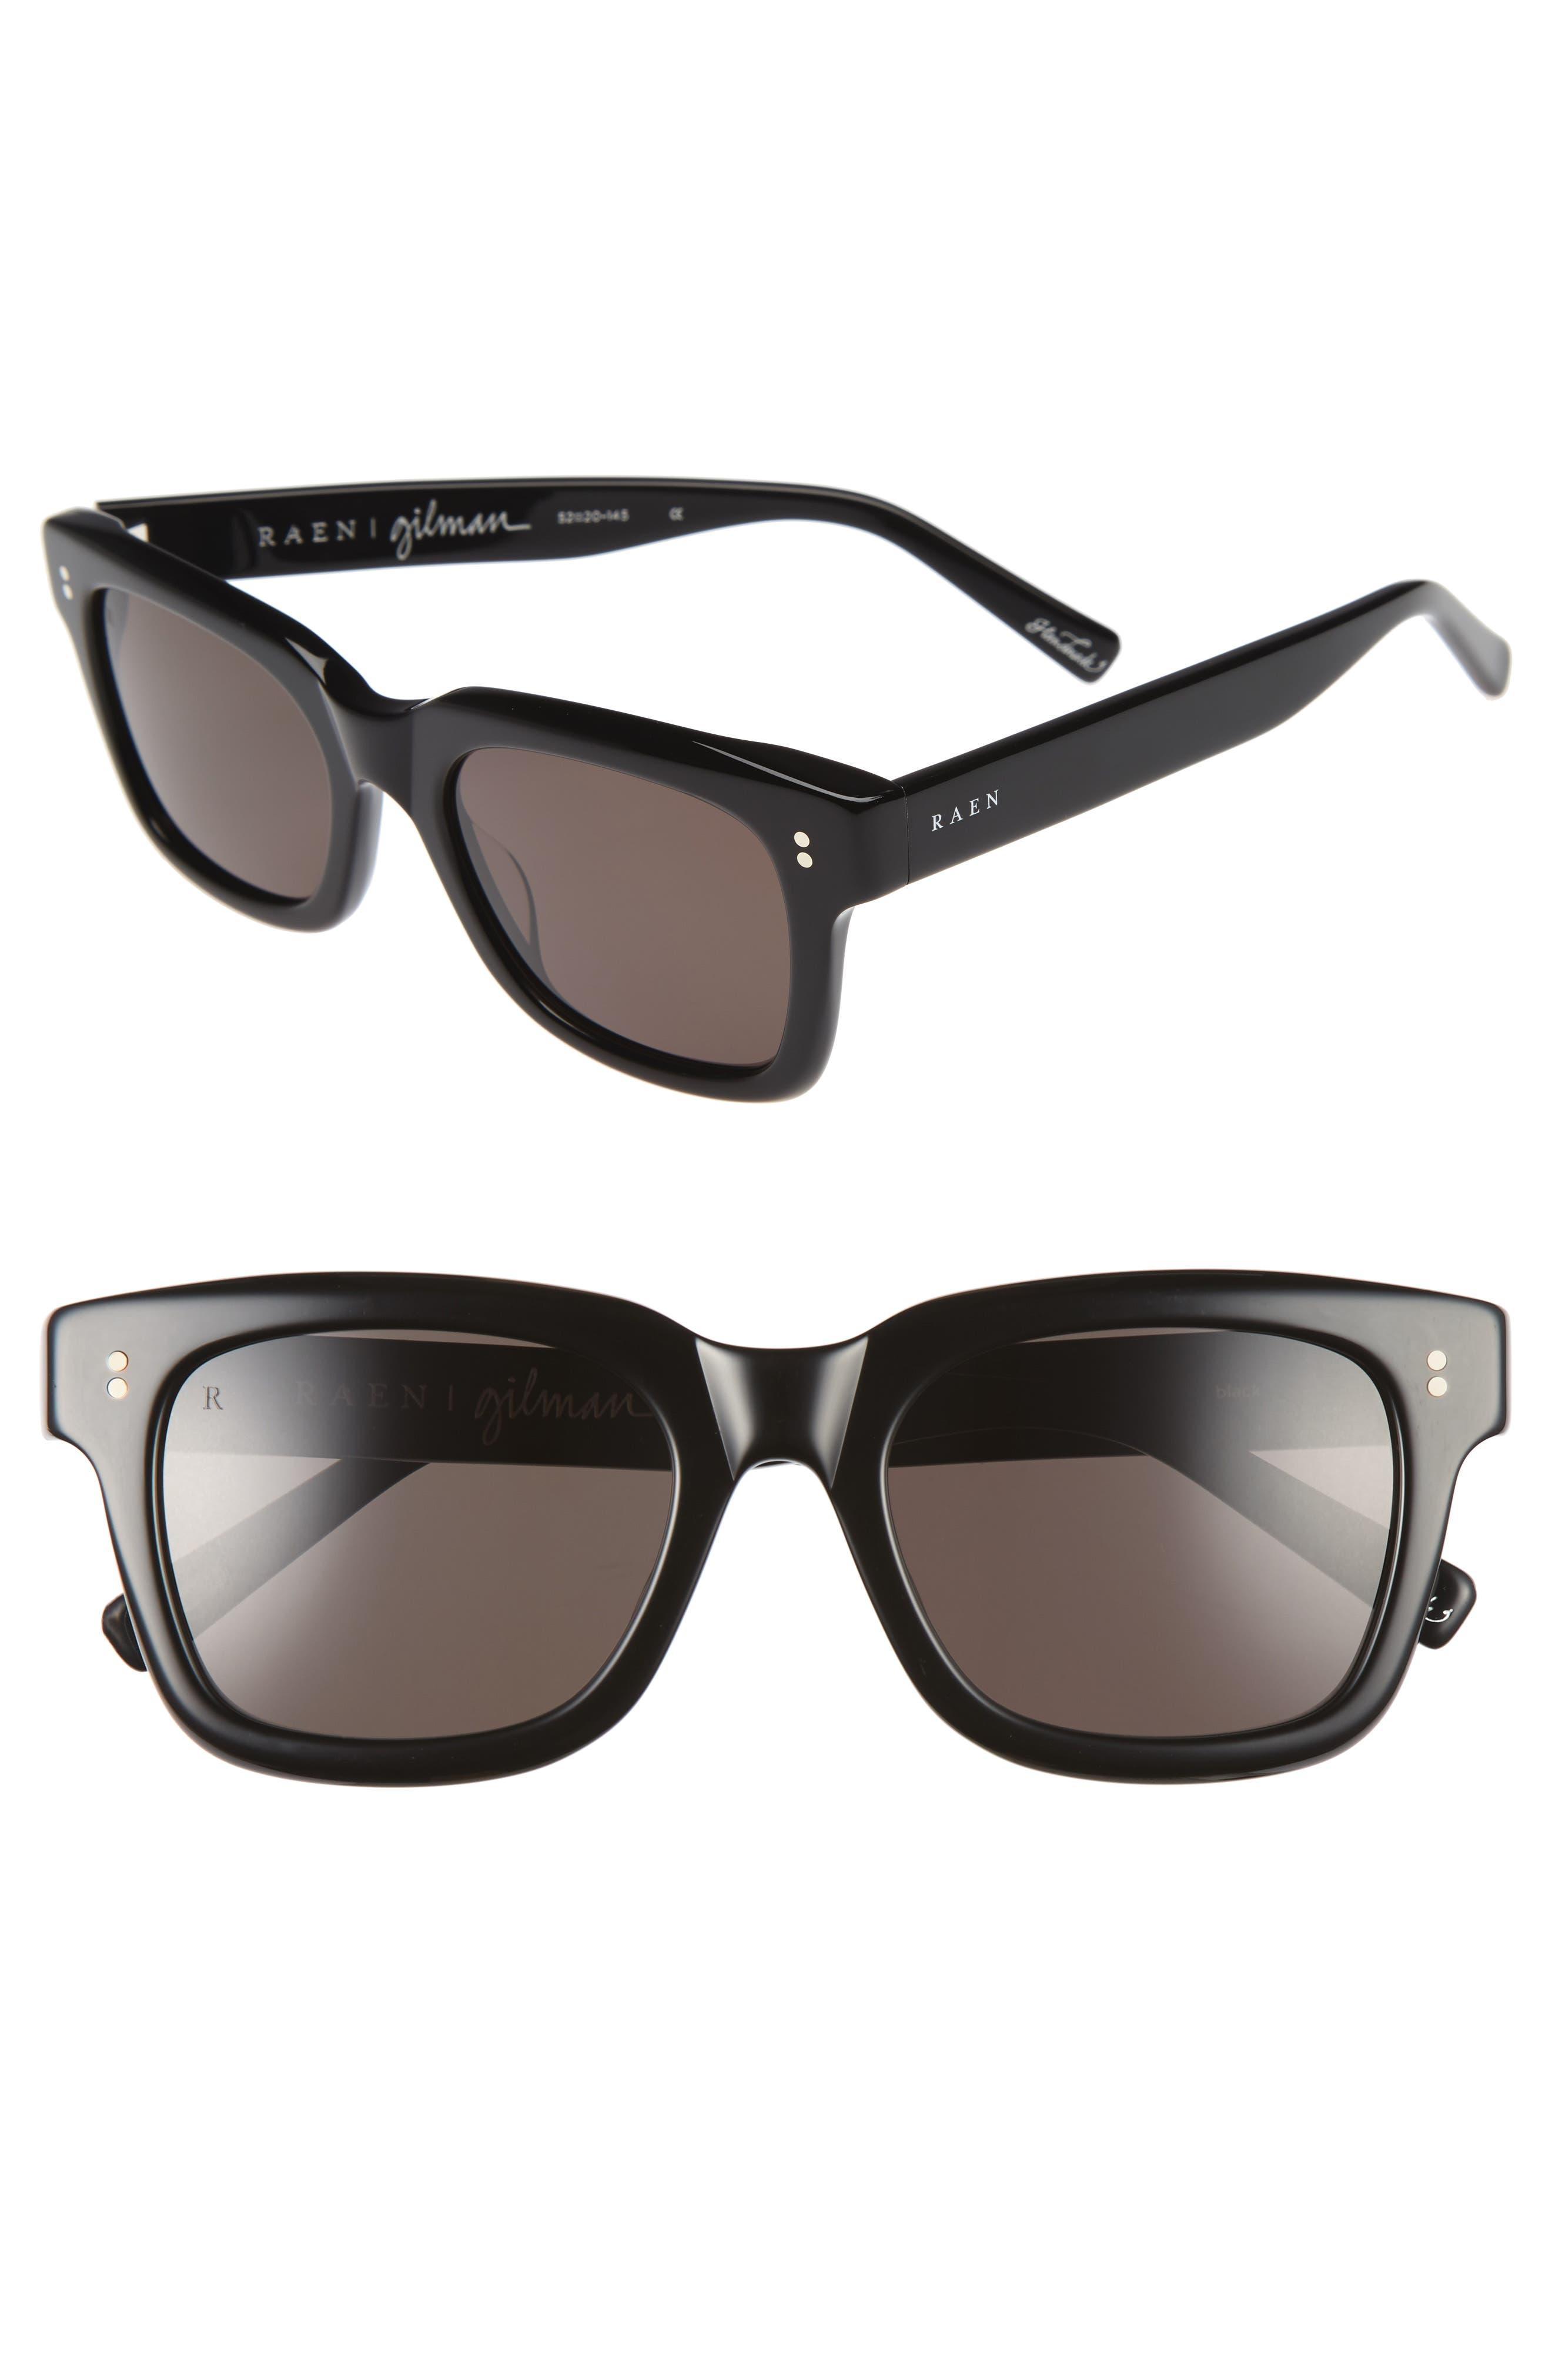 Gilman 52mm Sunglasses,                             Main thumbnail 1, color,                             001